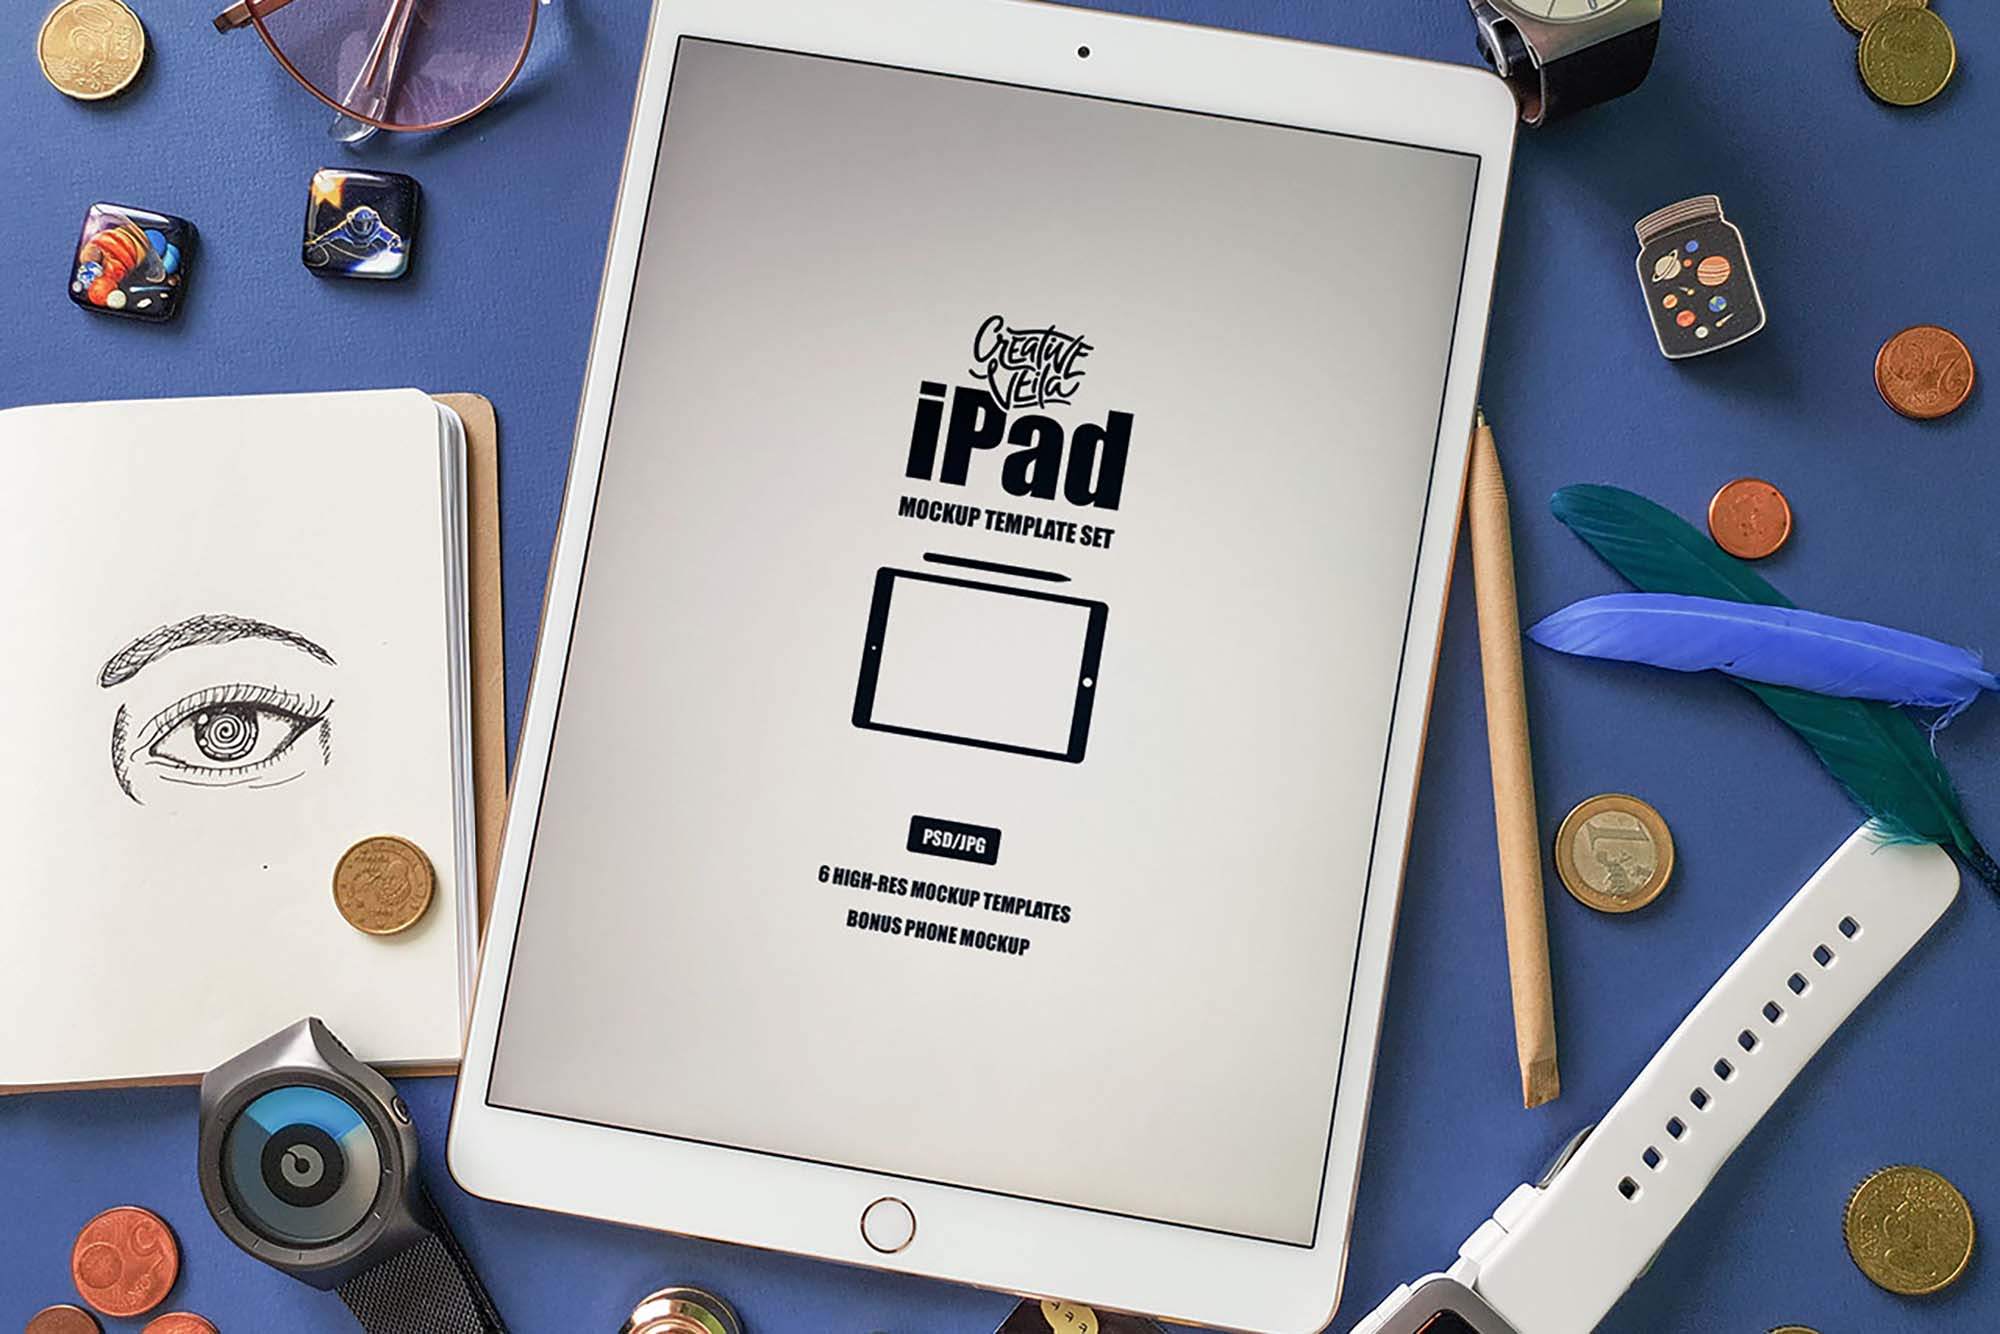 iPad Mockup Template 4